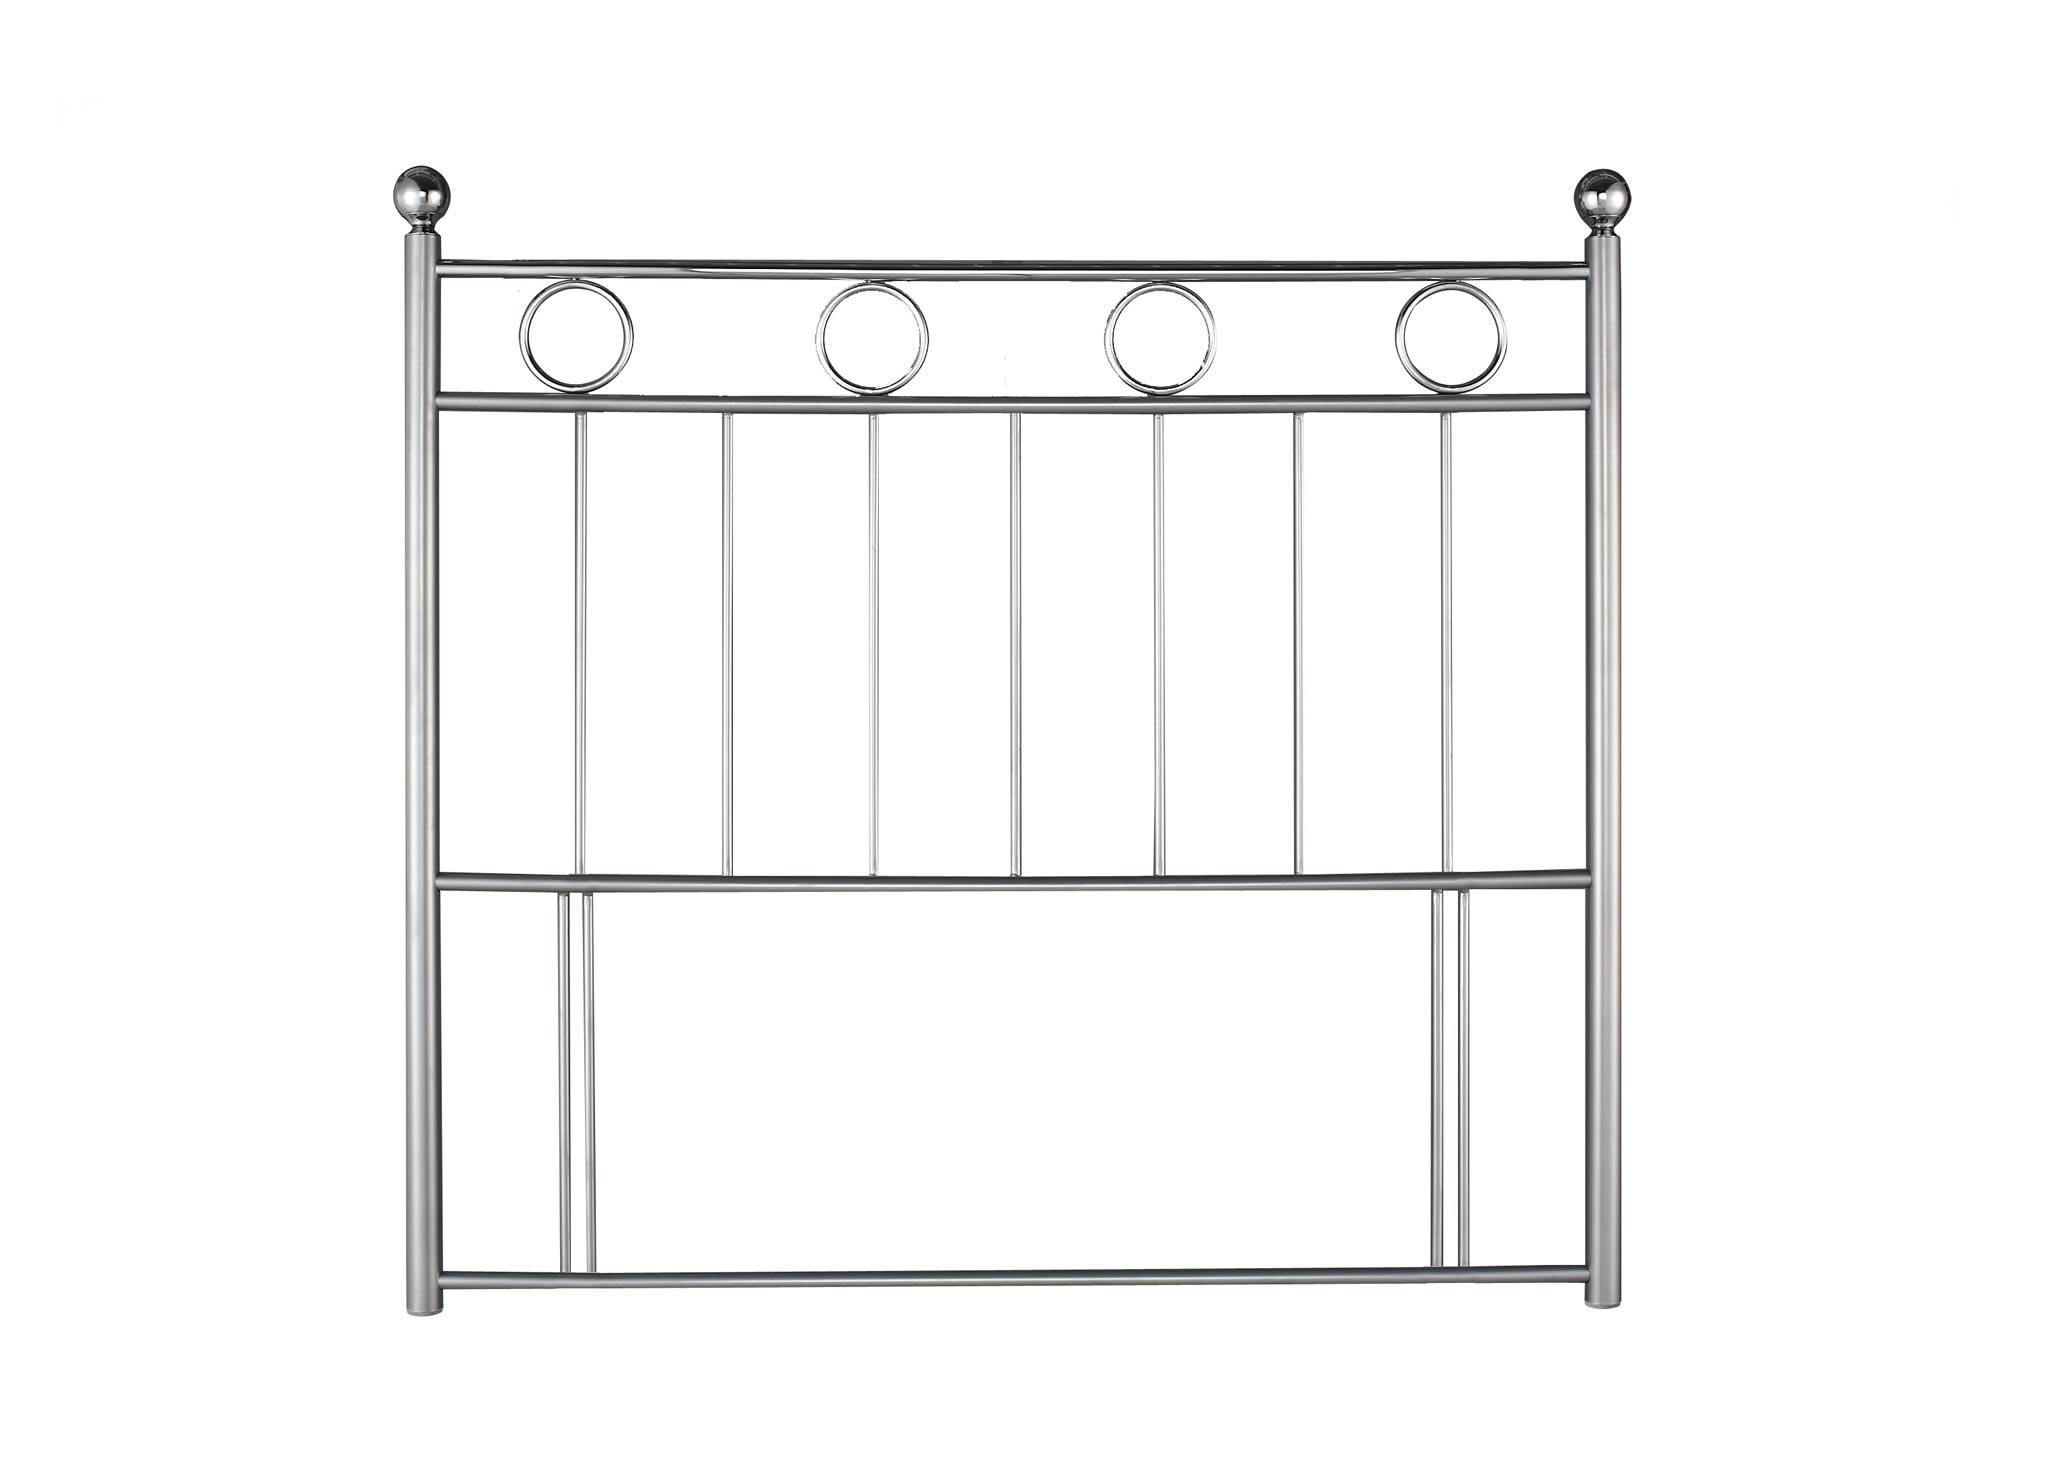 LONHB_Wholesale_Beds_Suppliers